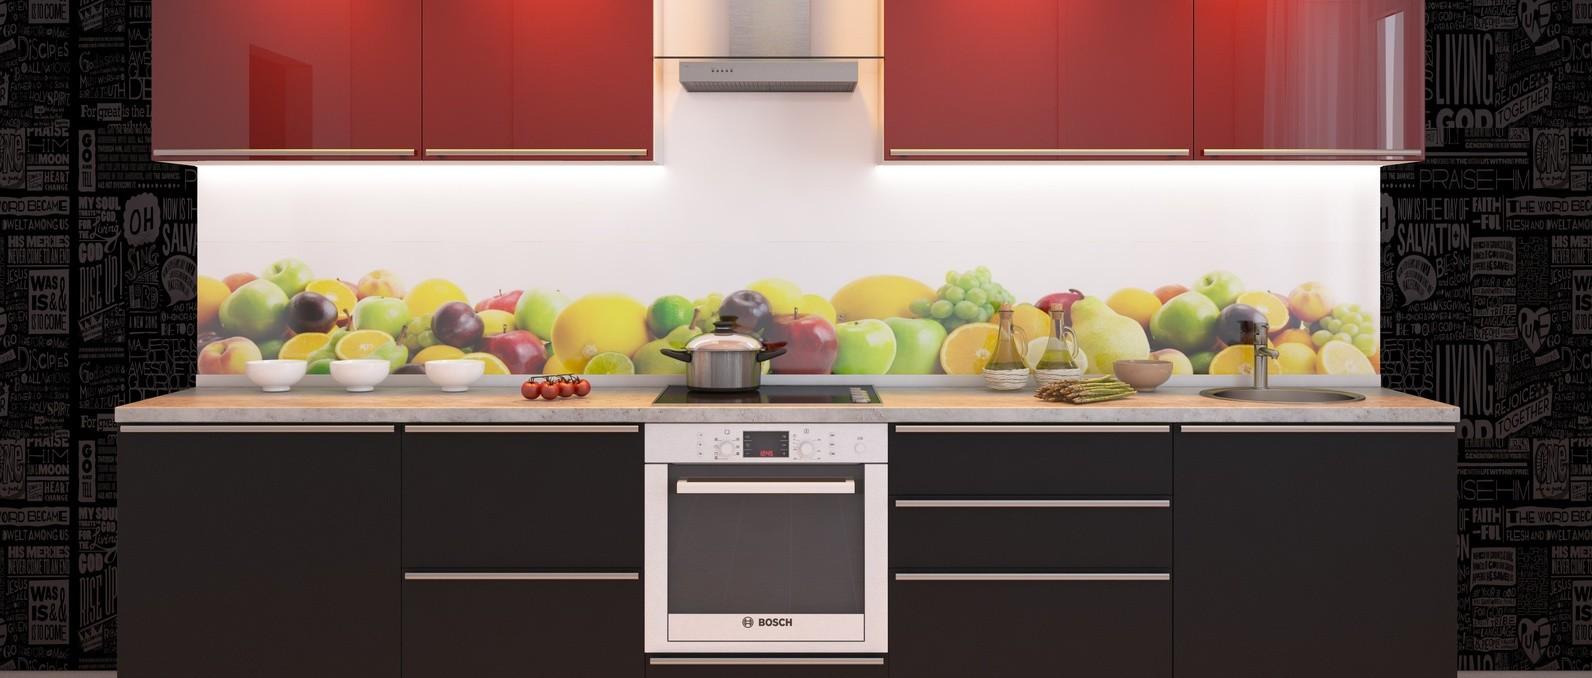 fototapeta w kuchni zamiast p�ytek